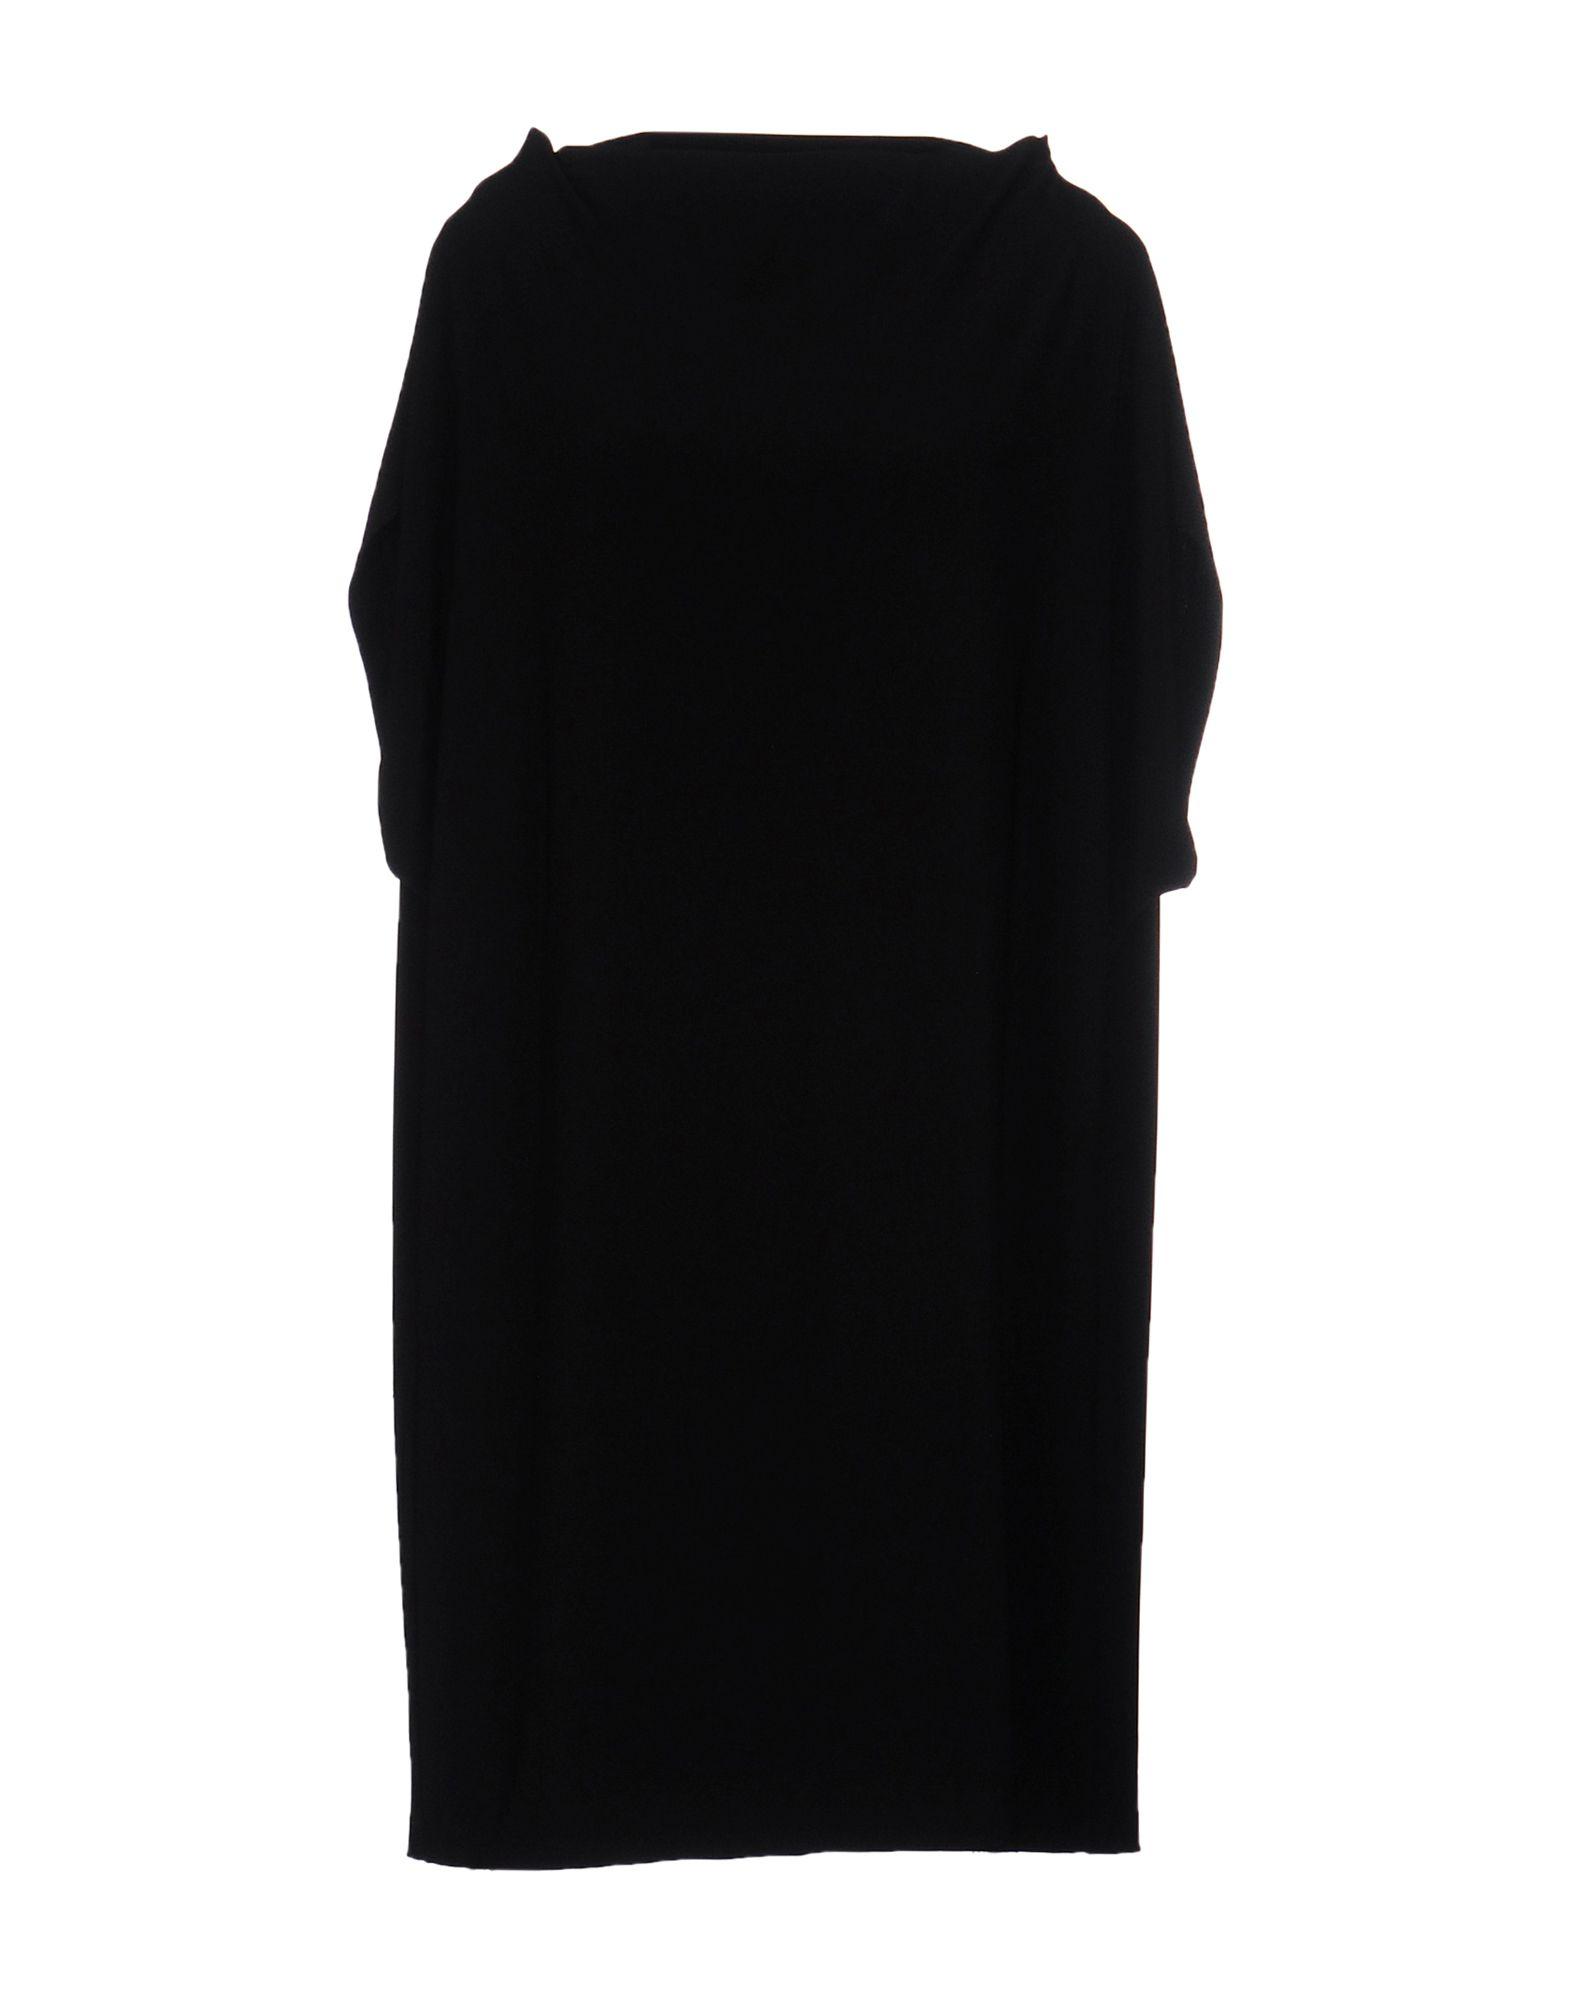 KAMALIKULTURE by NORMA KAMALI Короткое платье kamalikulture by norma kamali длинное платье